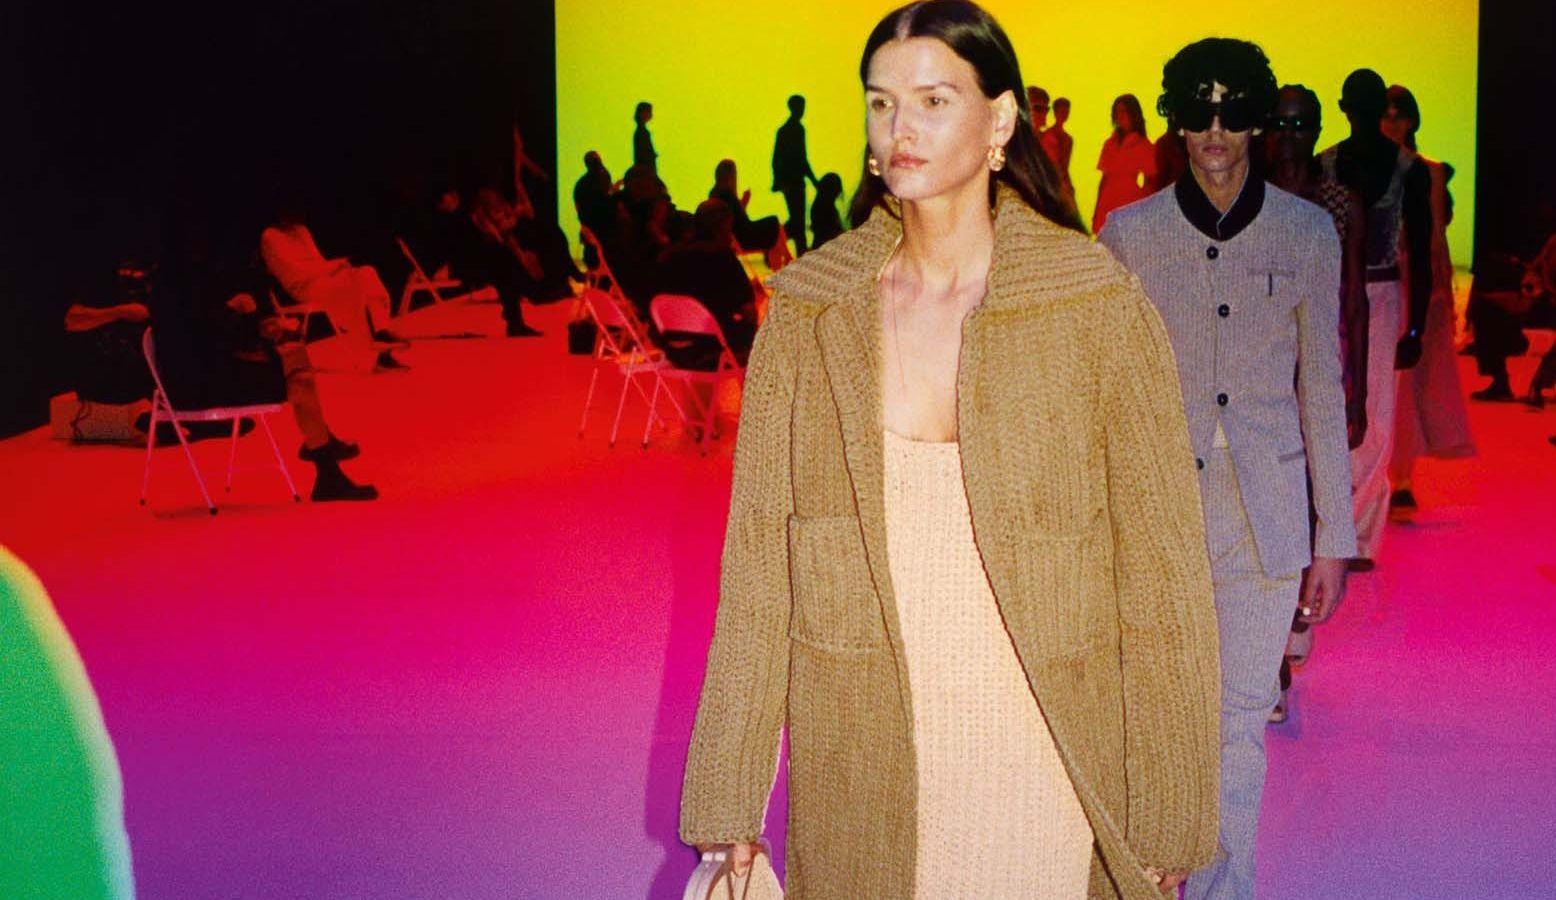 Bottega Veneta: Αποκαλύπτει τη «μυστική» συλλογή της για την Άνοιξη/Καλοκαίρι 2021